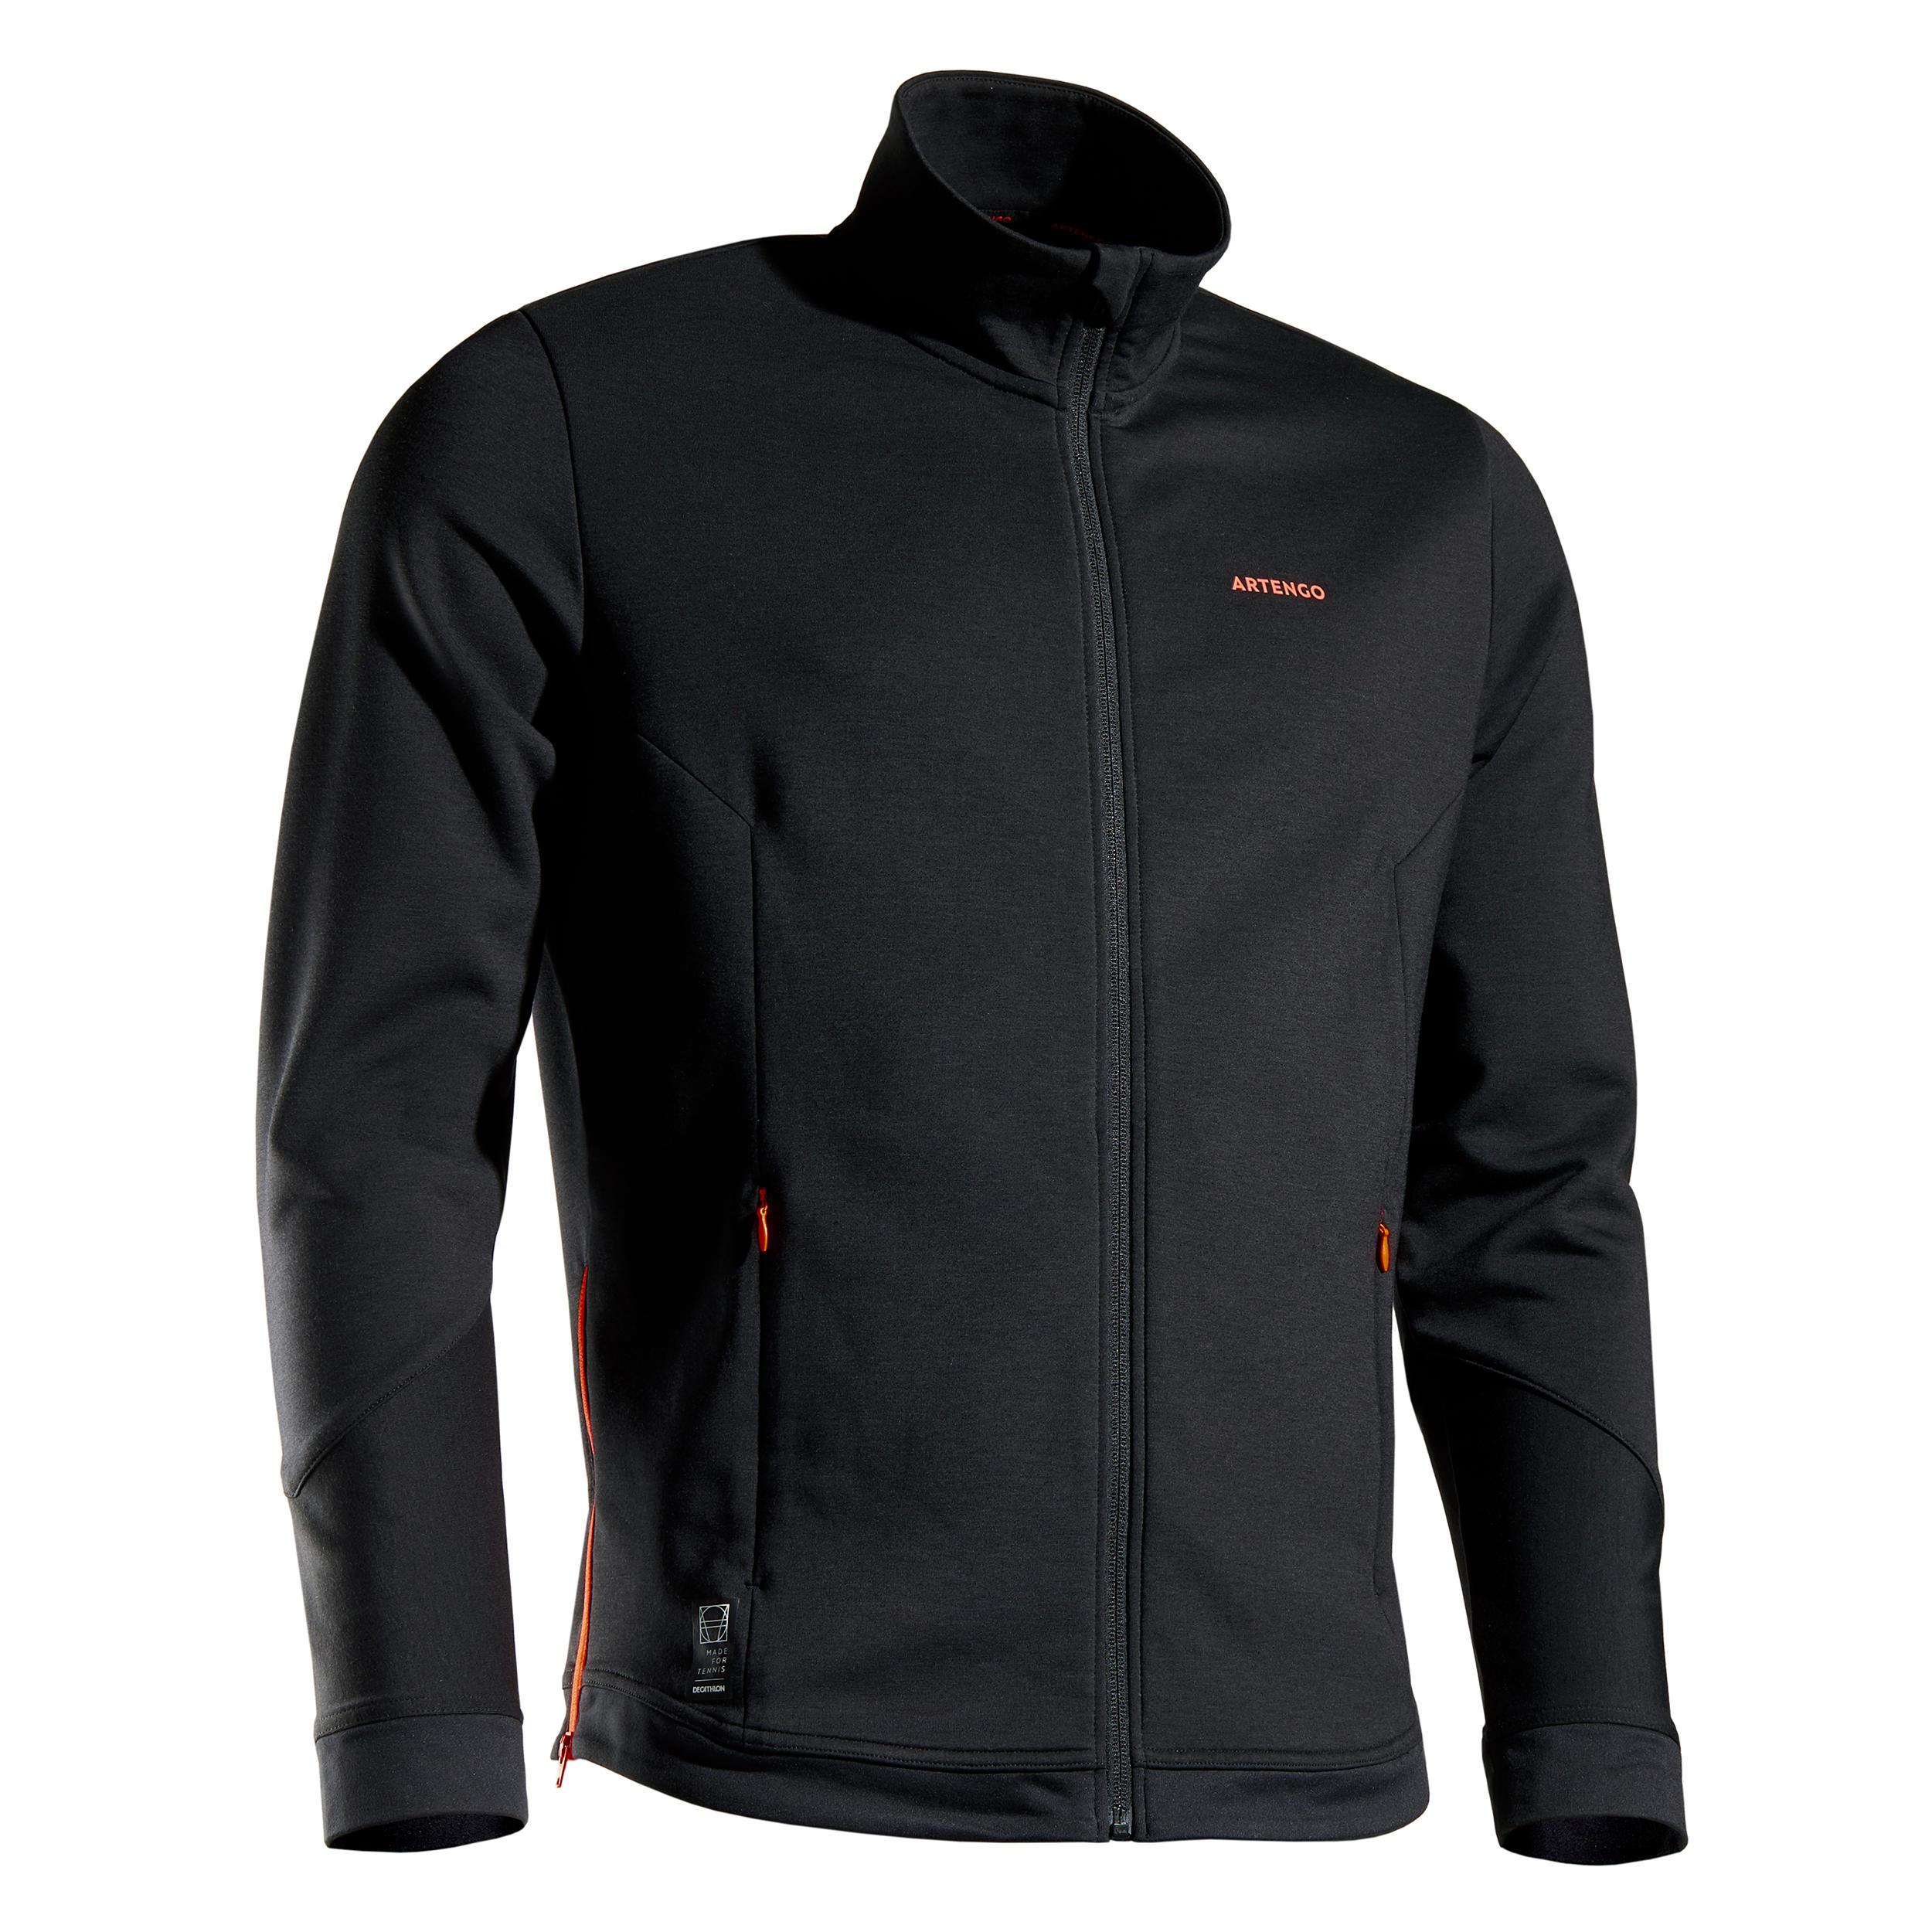 Jachetă Tenis TJA900 Bărbați imagine